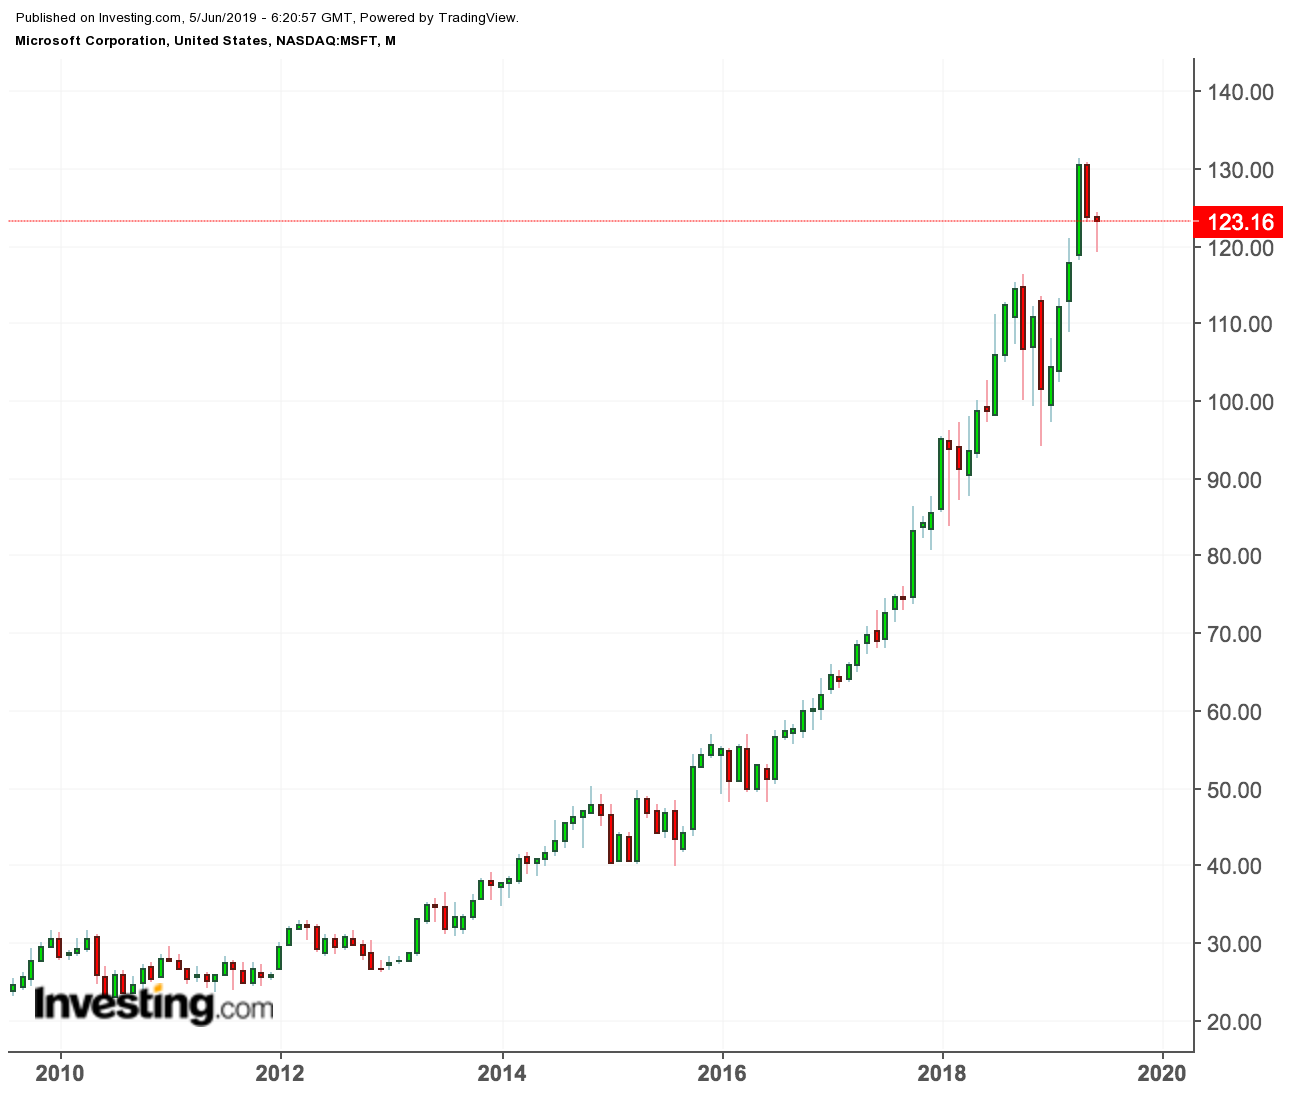 Microsoft price chart